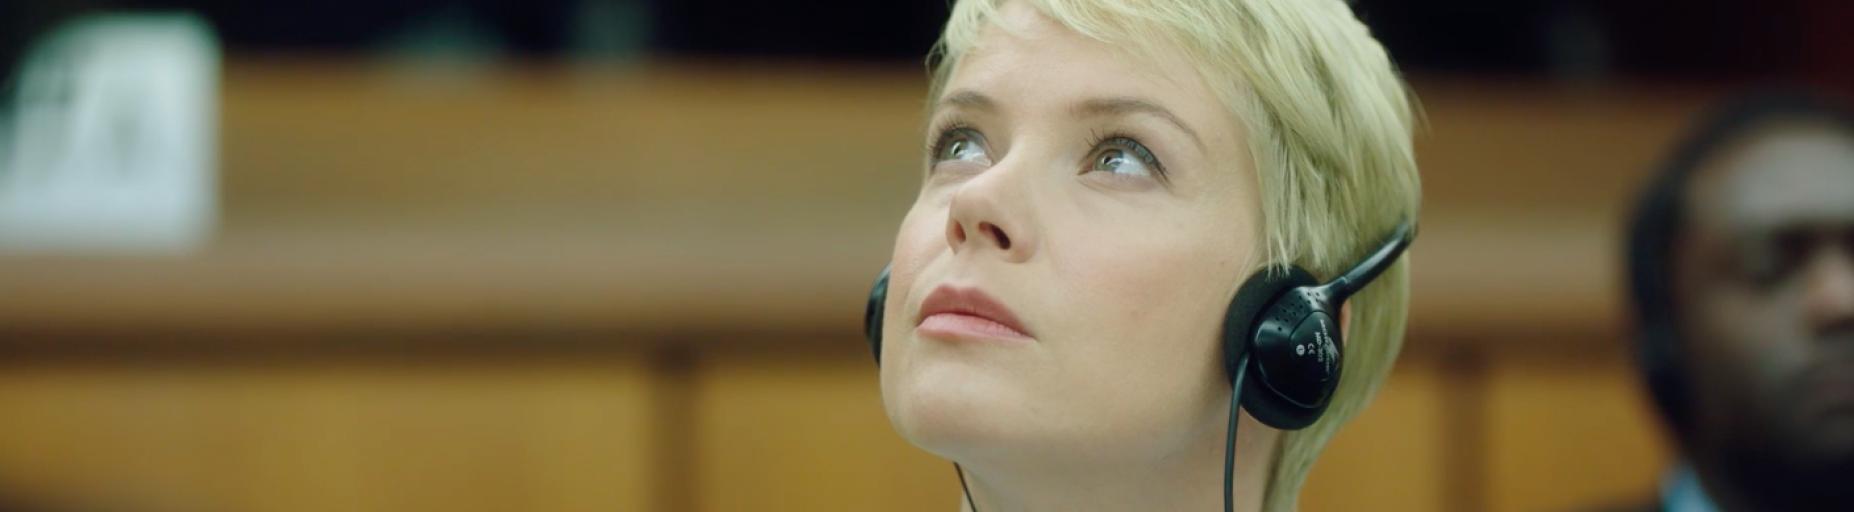 Oscar shortlistes Tóth Barnabás Susotázs című kisfilmje